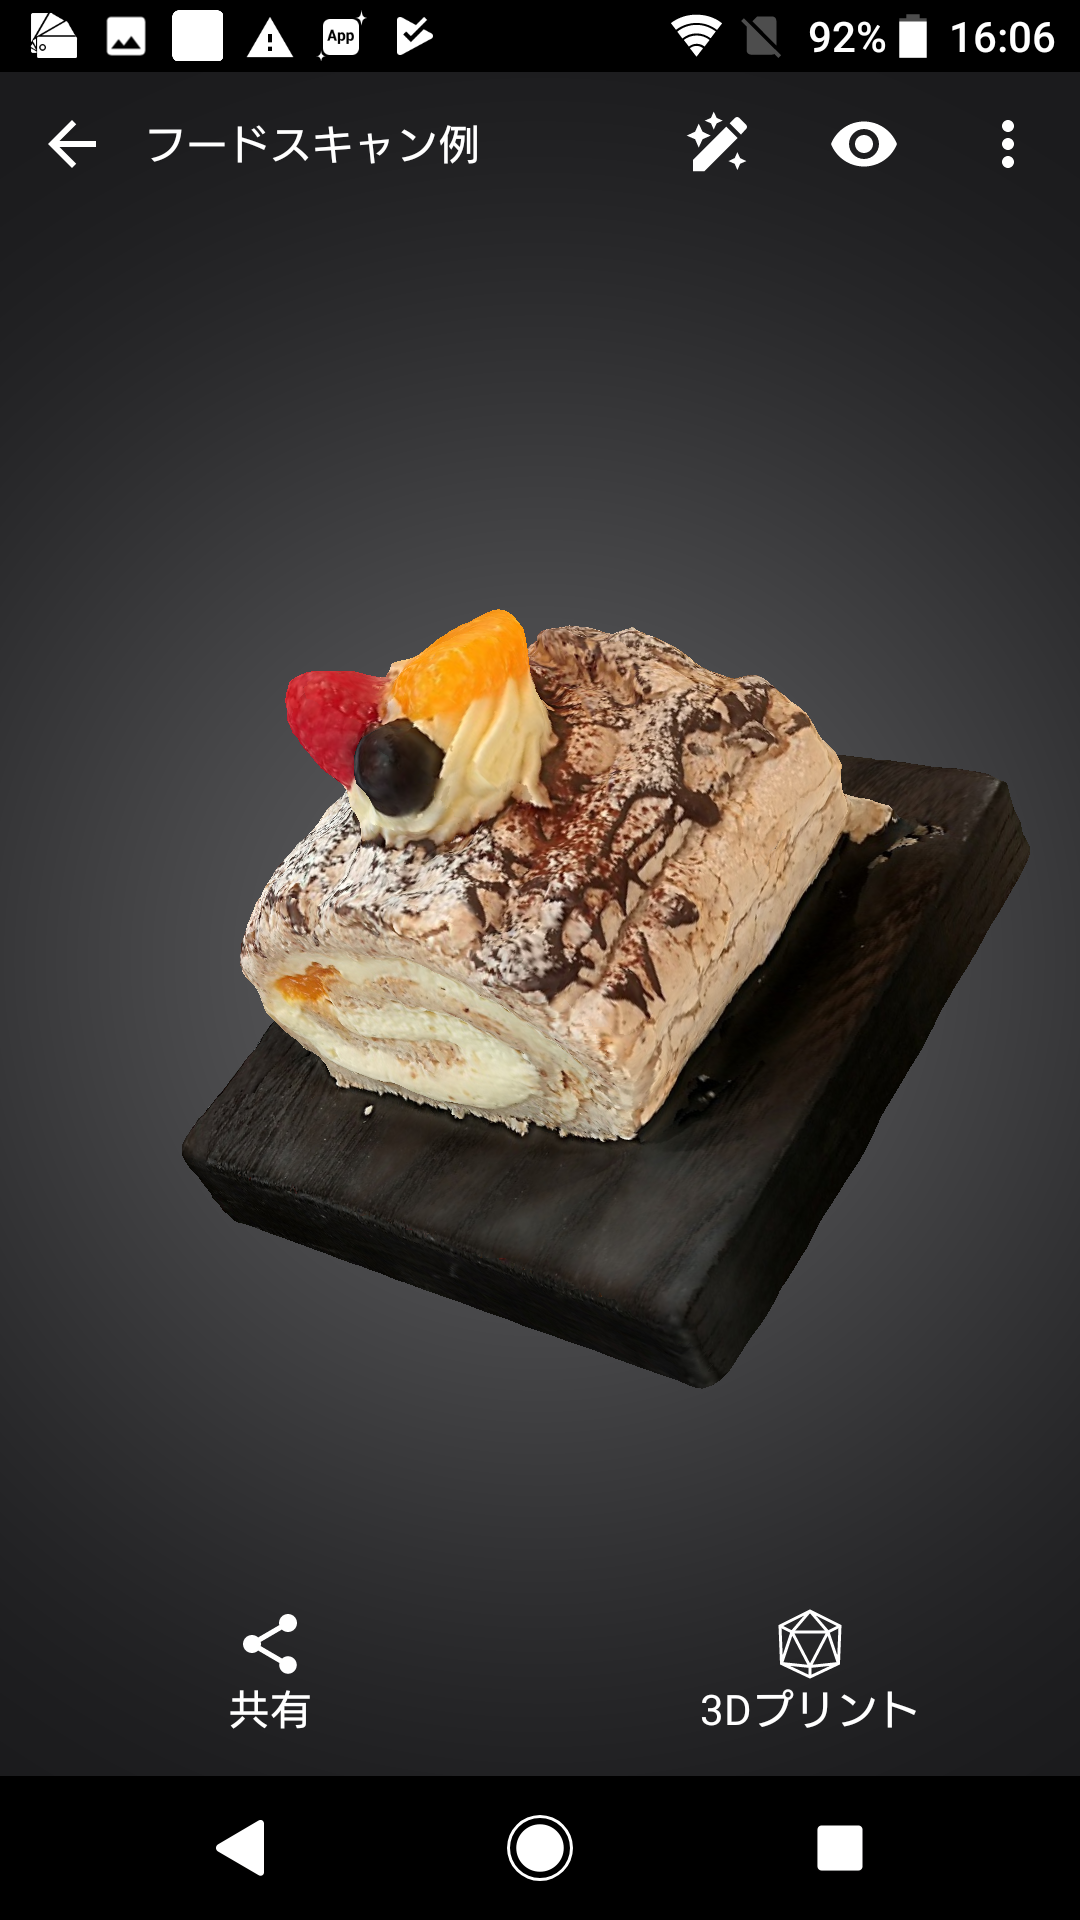 Sony Xperia XZ1 3Dクリエーター 3Dプリント 自由造形スキャン ケーキ4